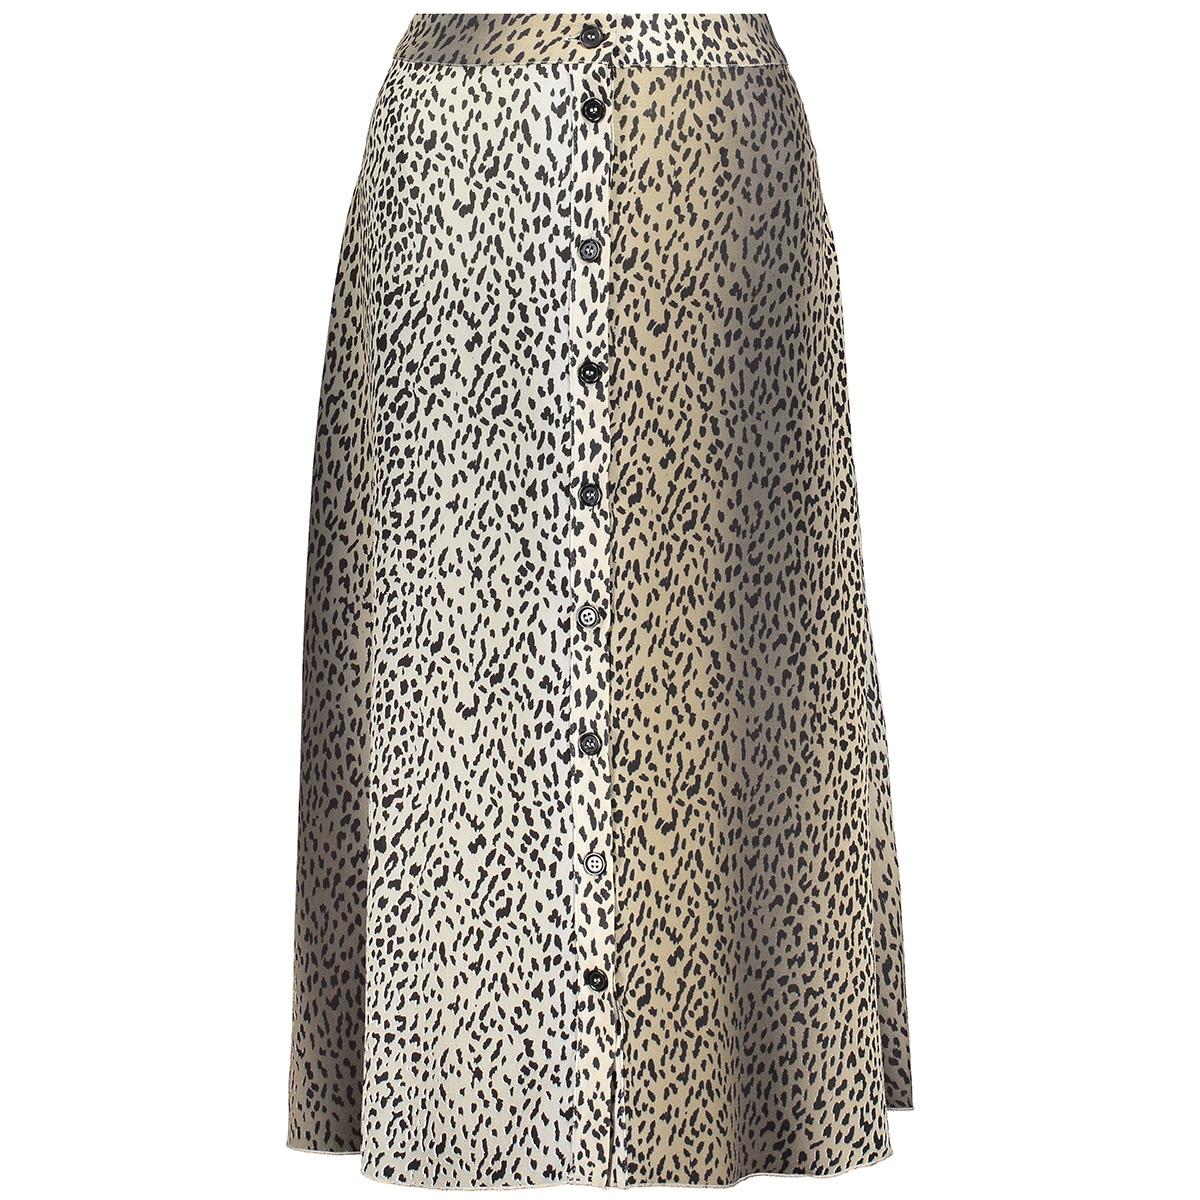 skirt aop leopard 060020 geisha rok sand/black